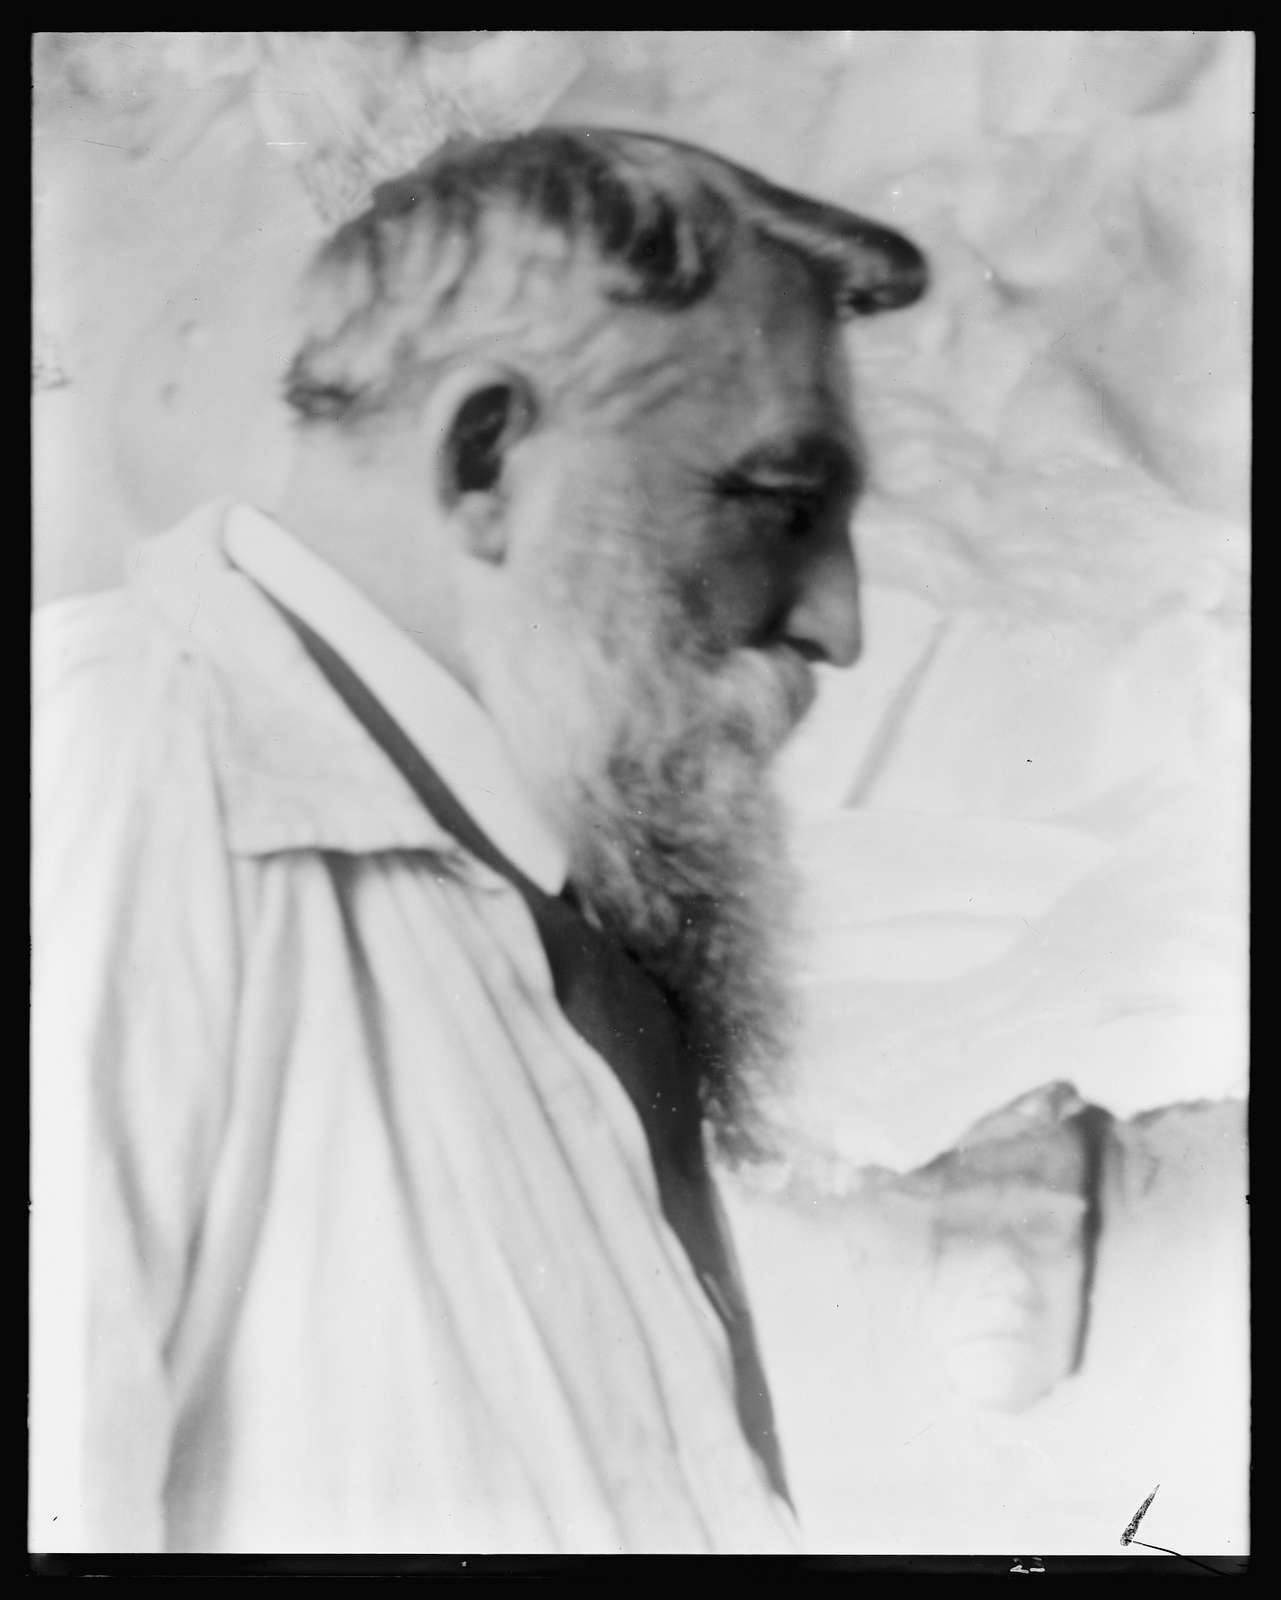 [Auguste Rodin]